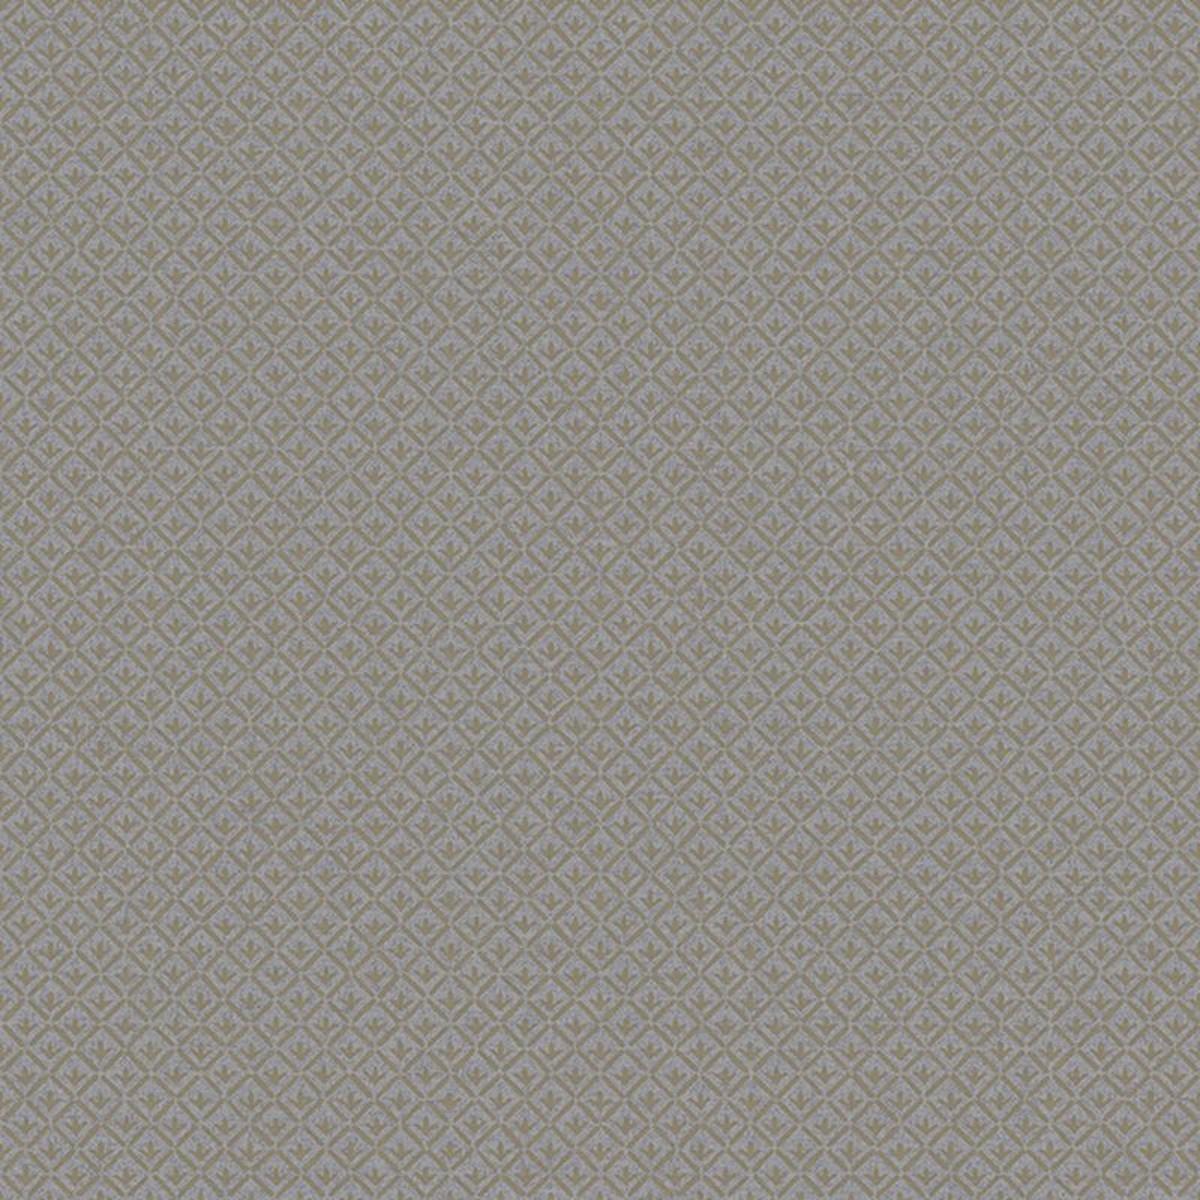 Обои флизелиновые The Paper Partnership Patterdale серые 0.53 м WP0111202